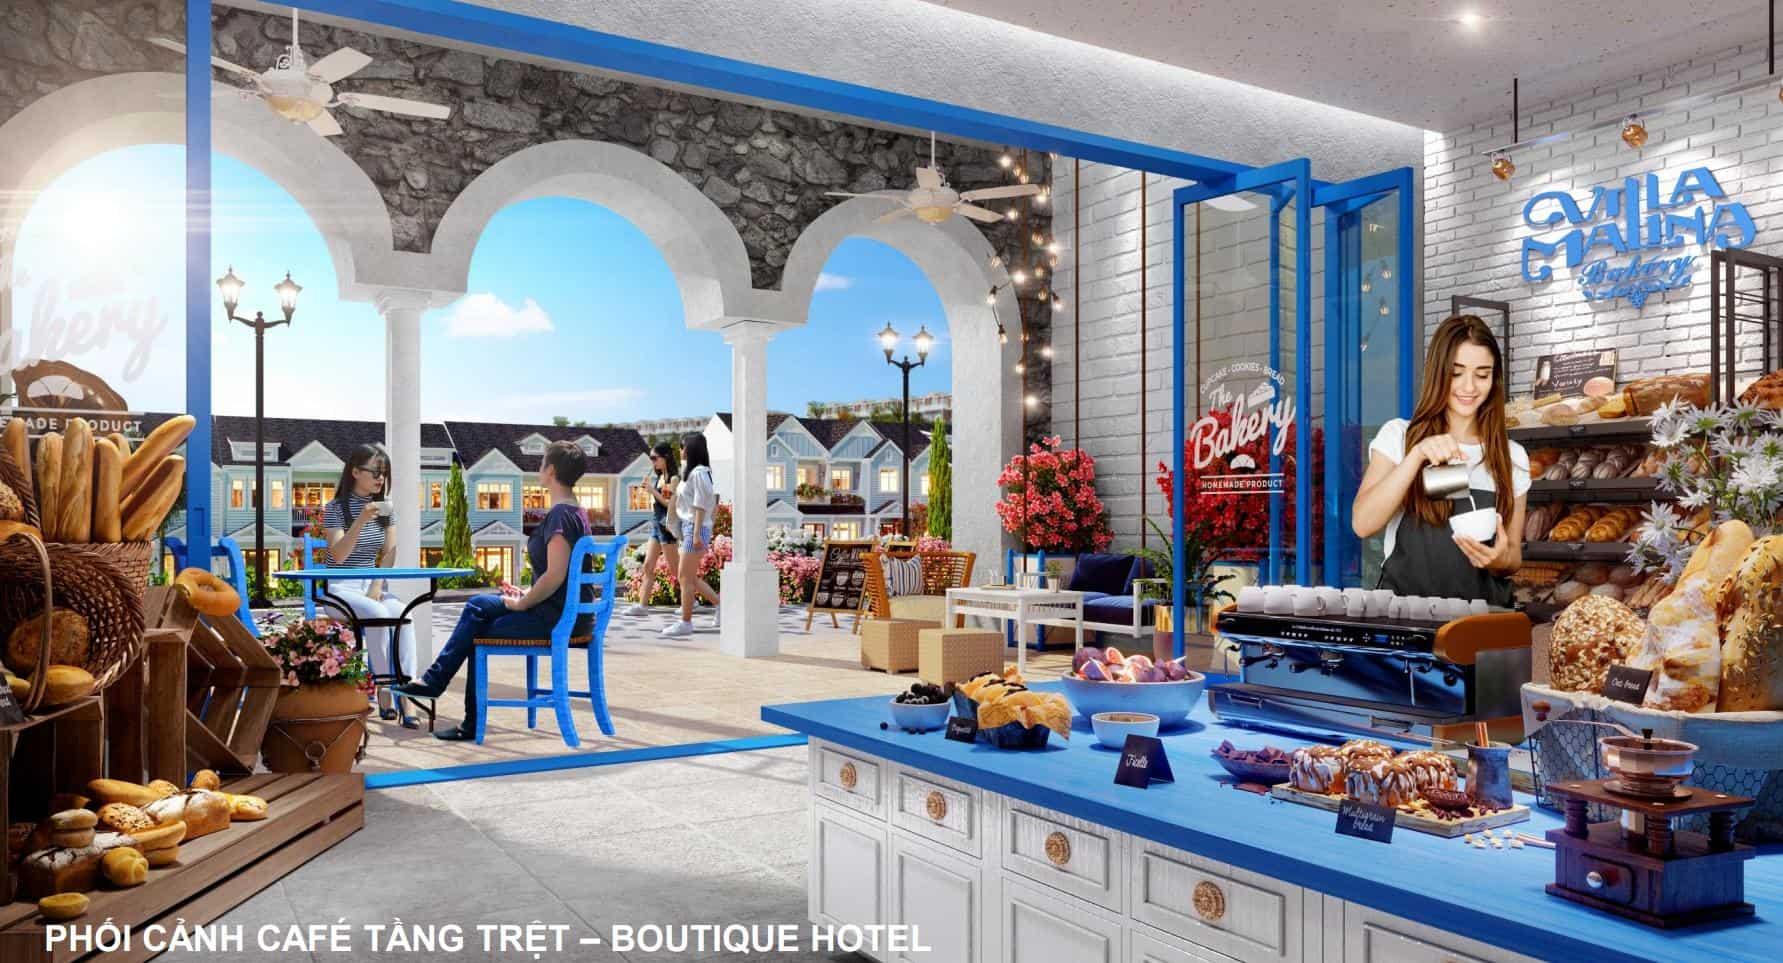 Boutique hotel nội thất